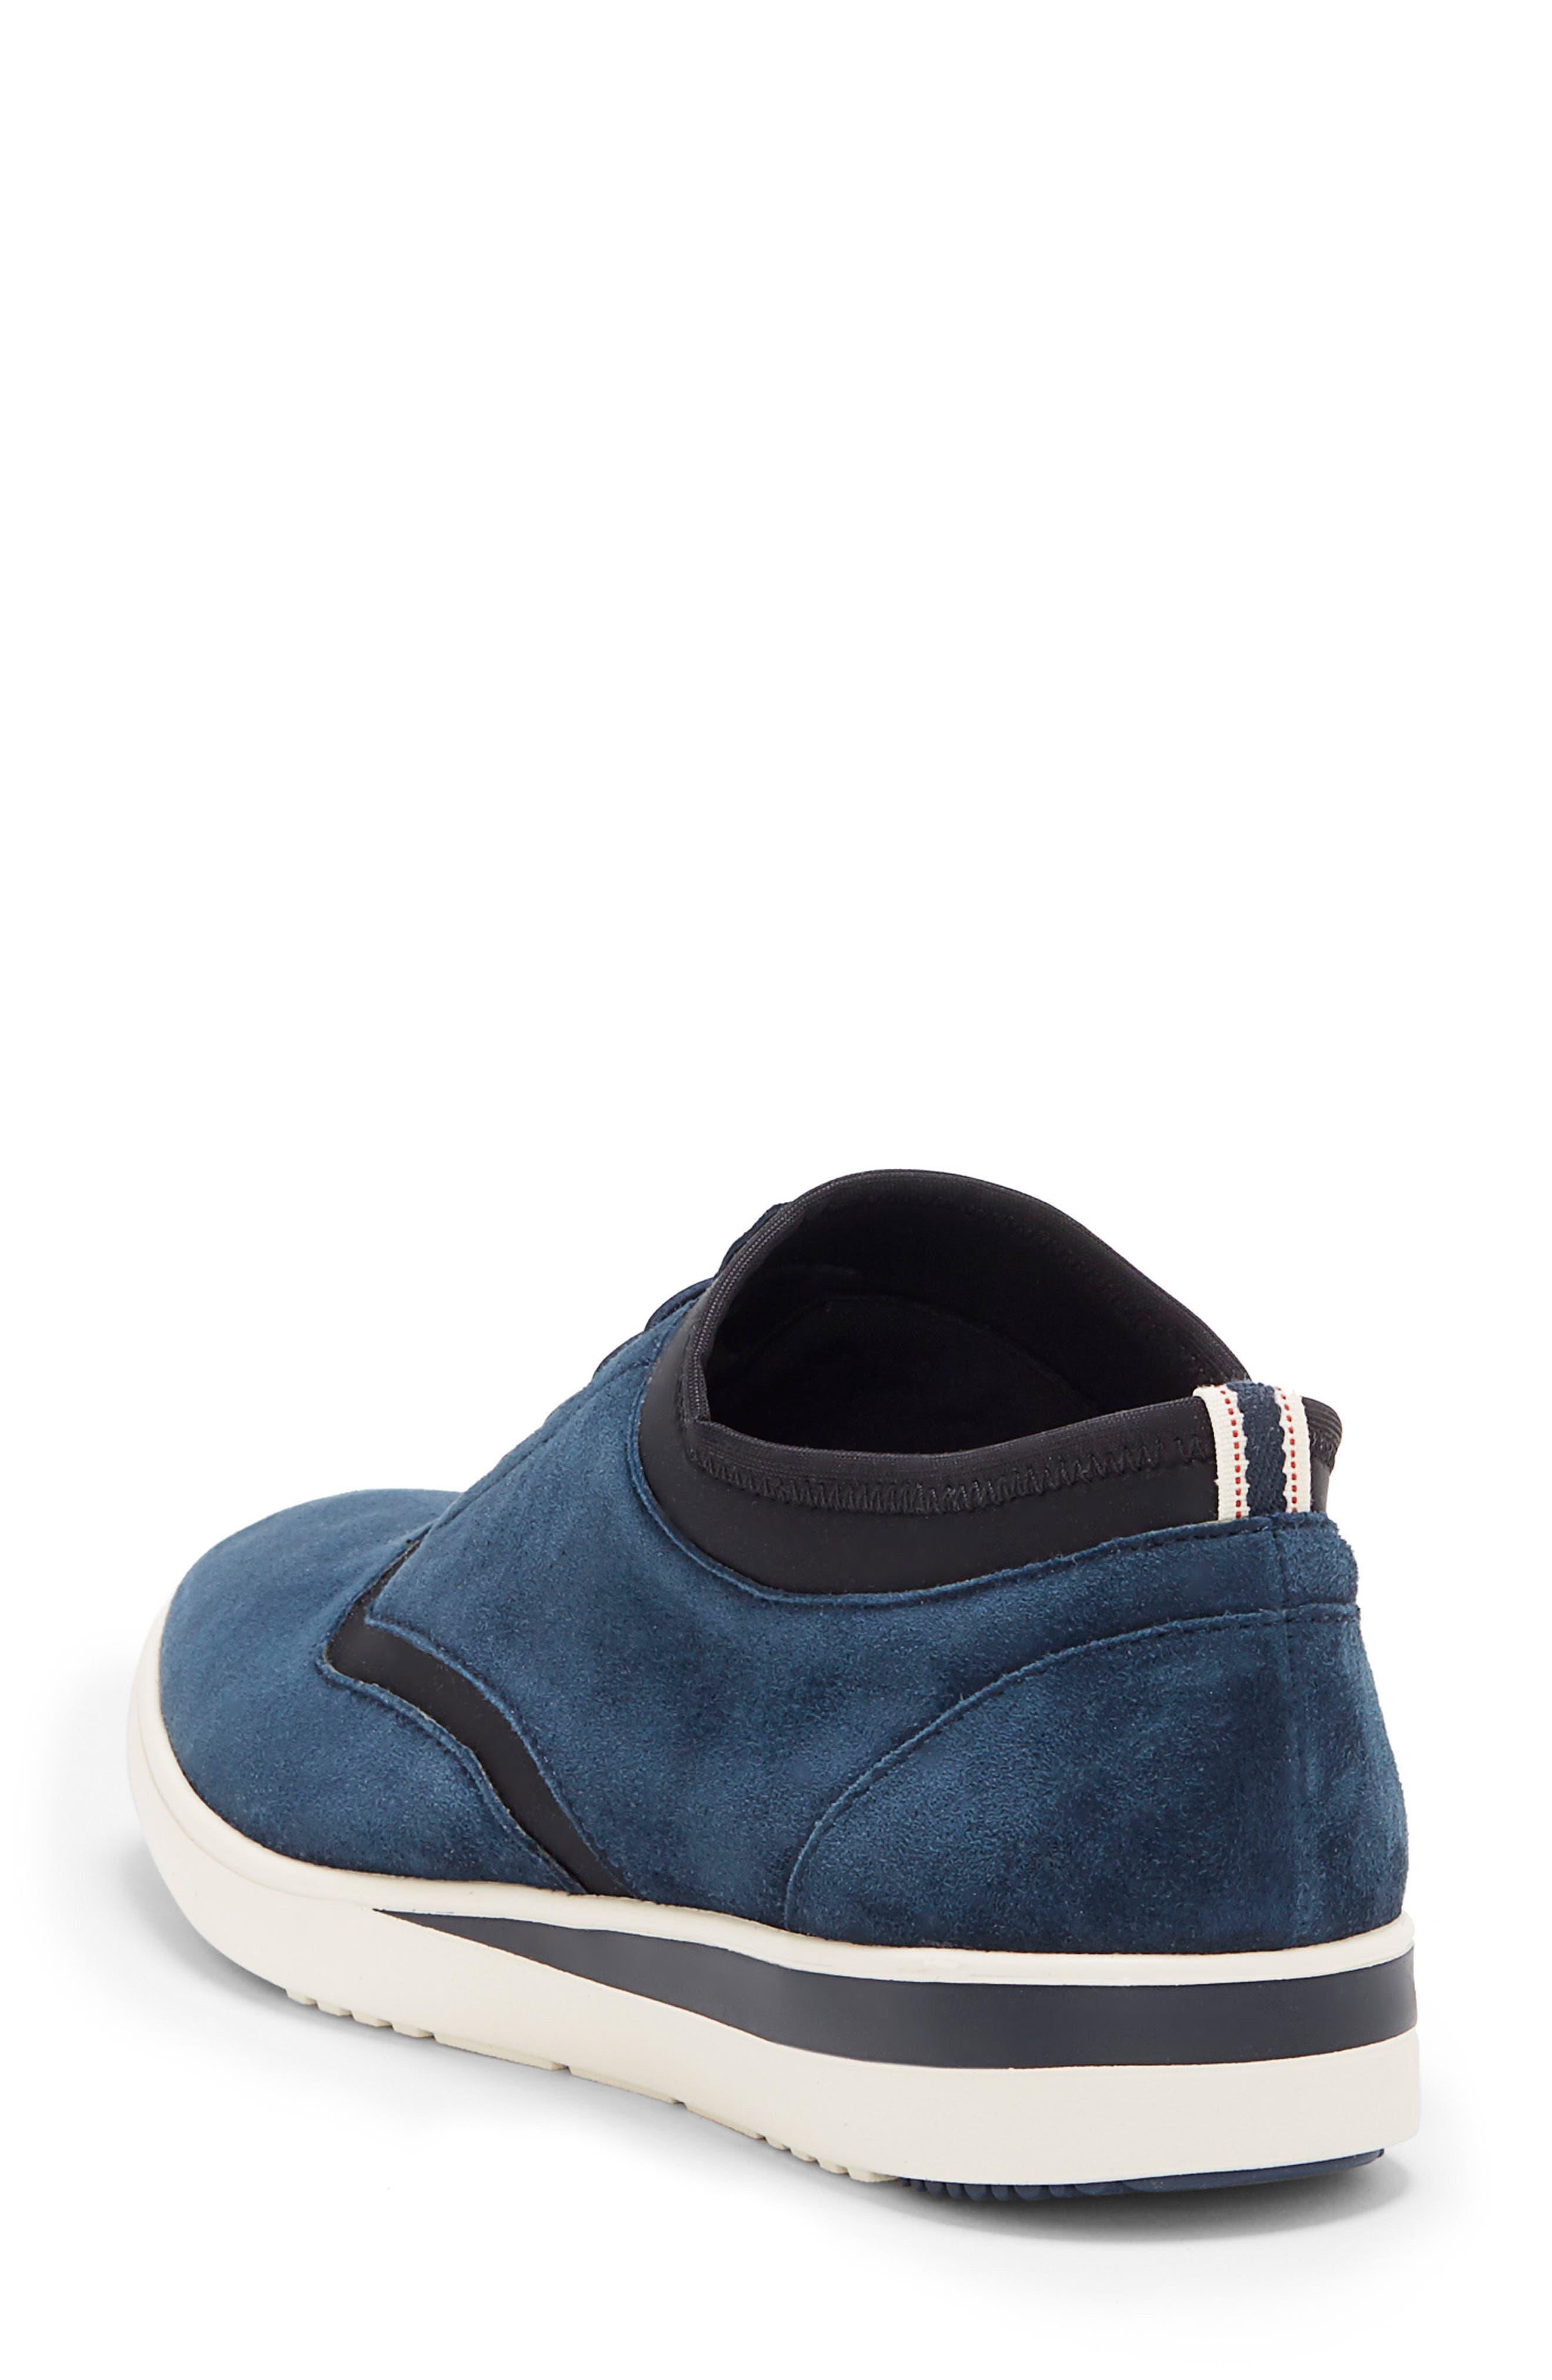 Atala Sneaker,                             Alternate thumbnail 6, color,